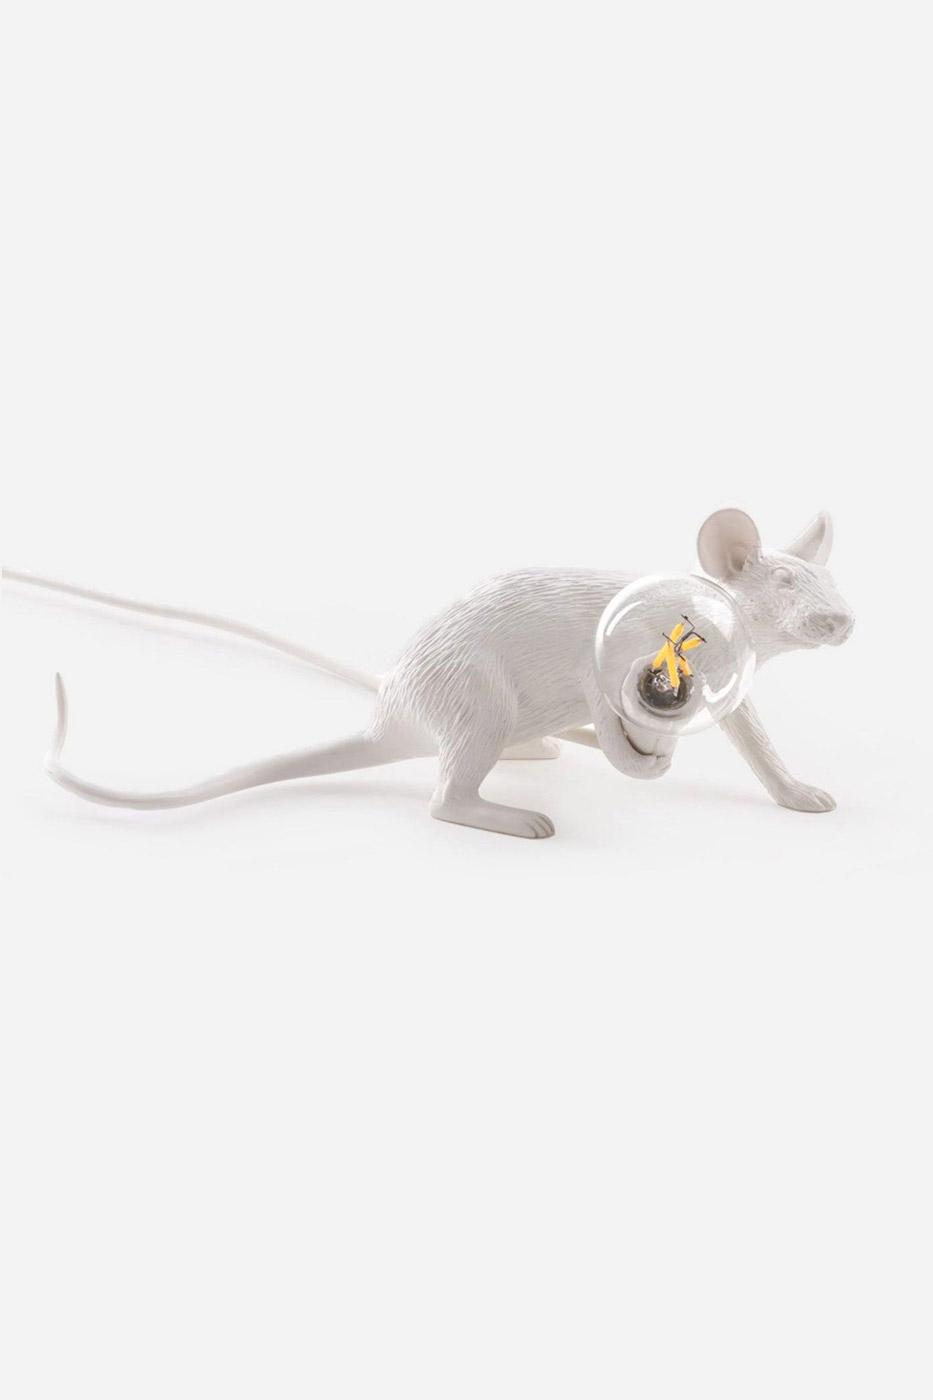 Bordslampa mus liggande vit